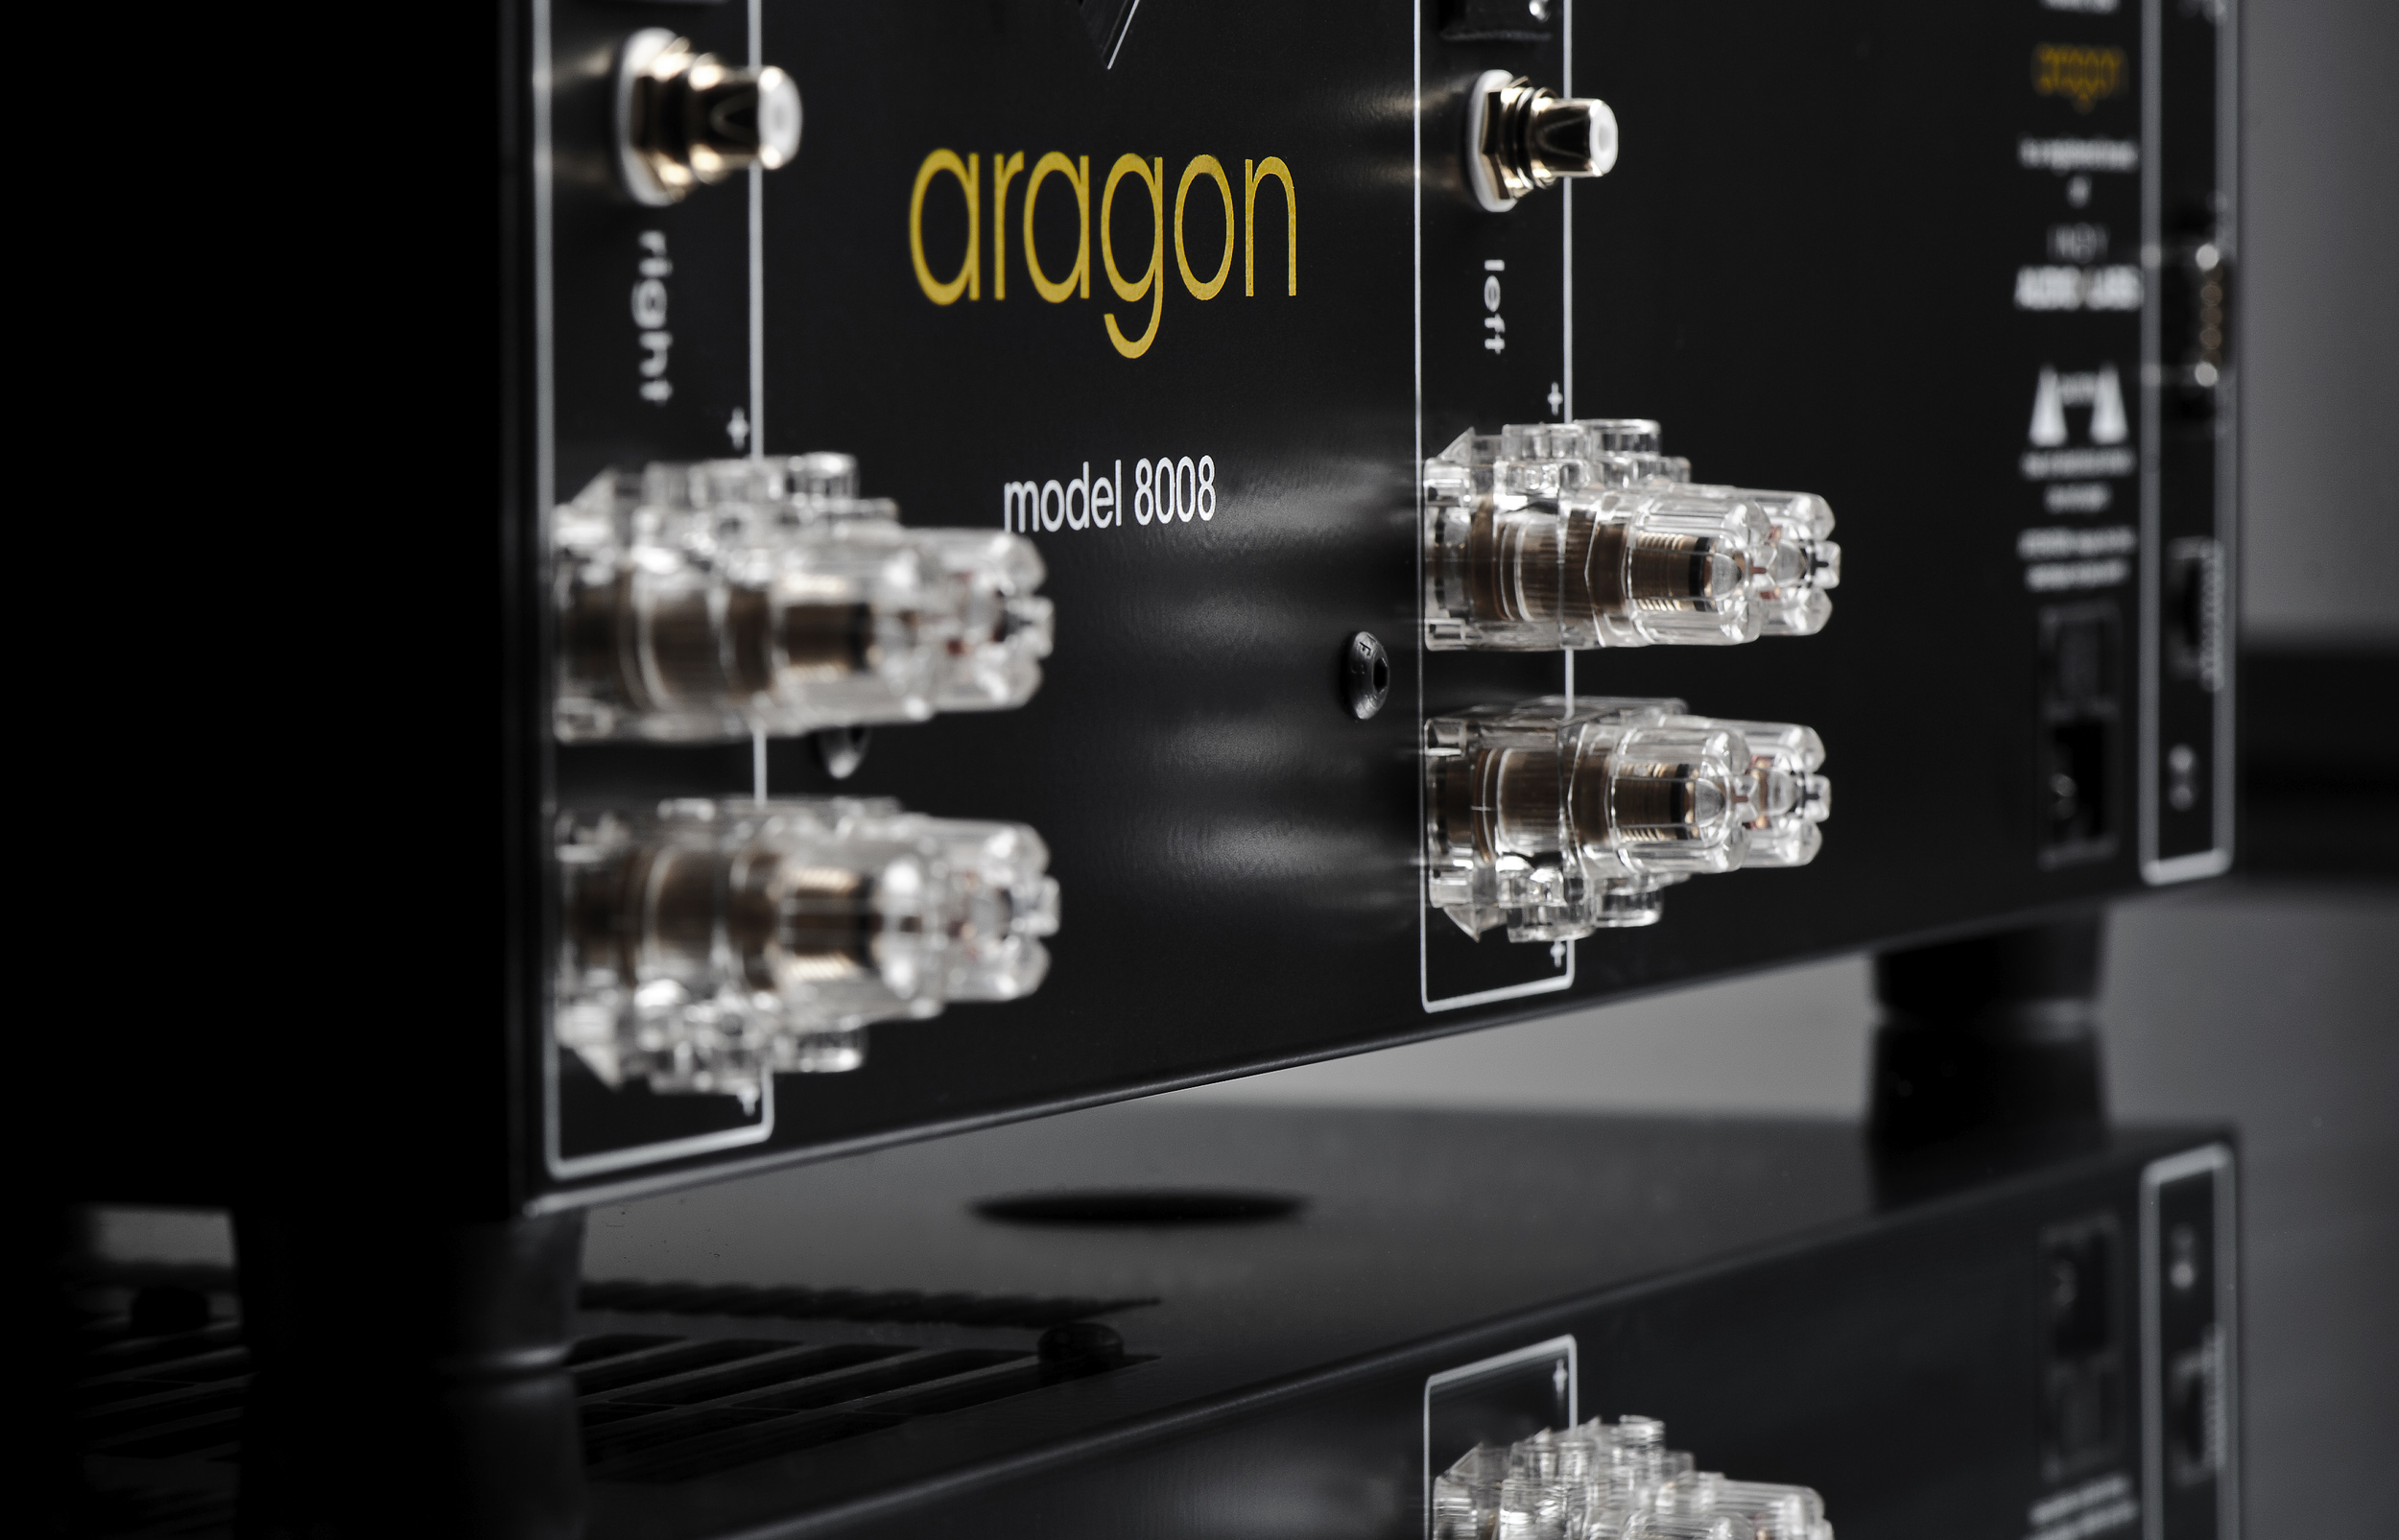 Aragon_17_crop.jpg